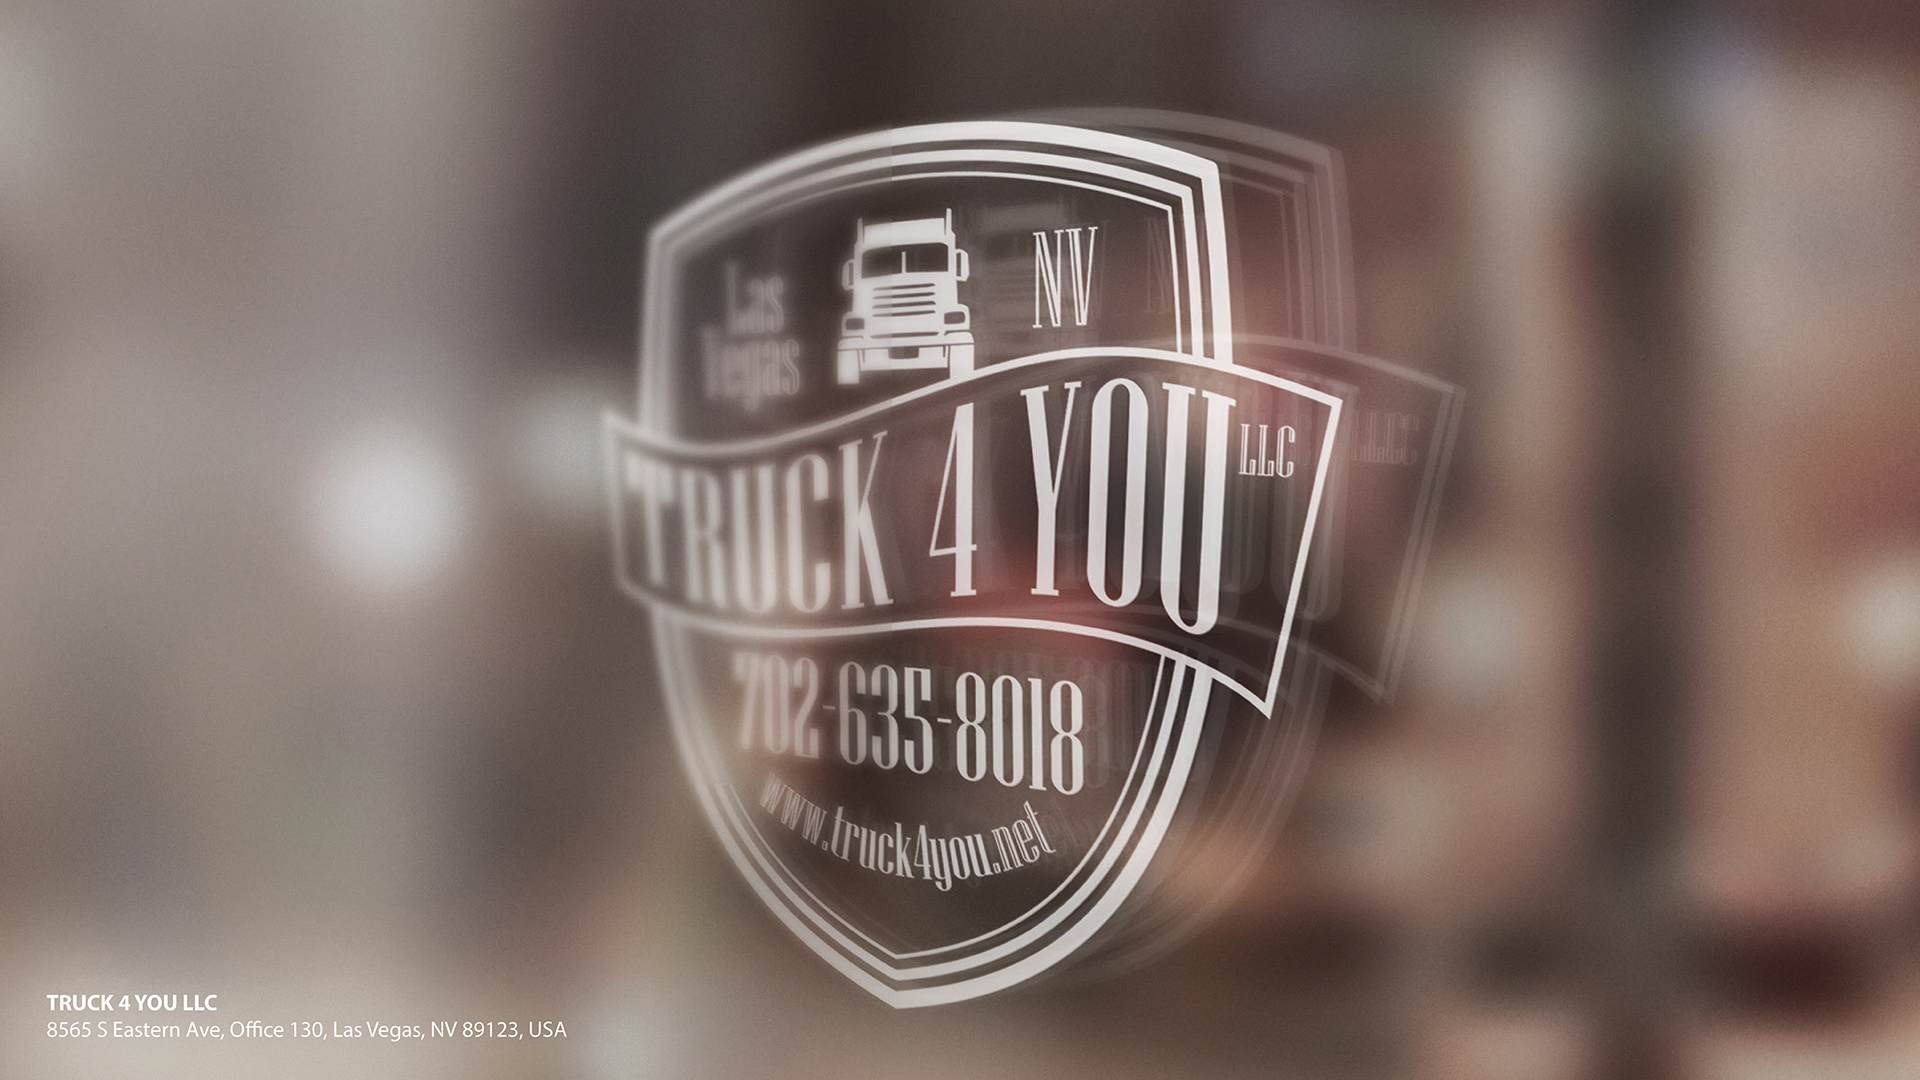 Truck4youxLoboHouse